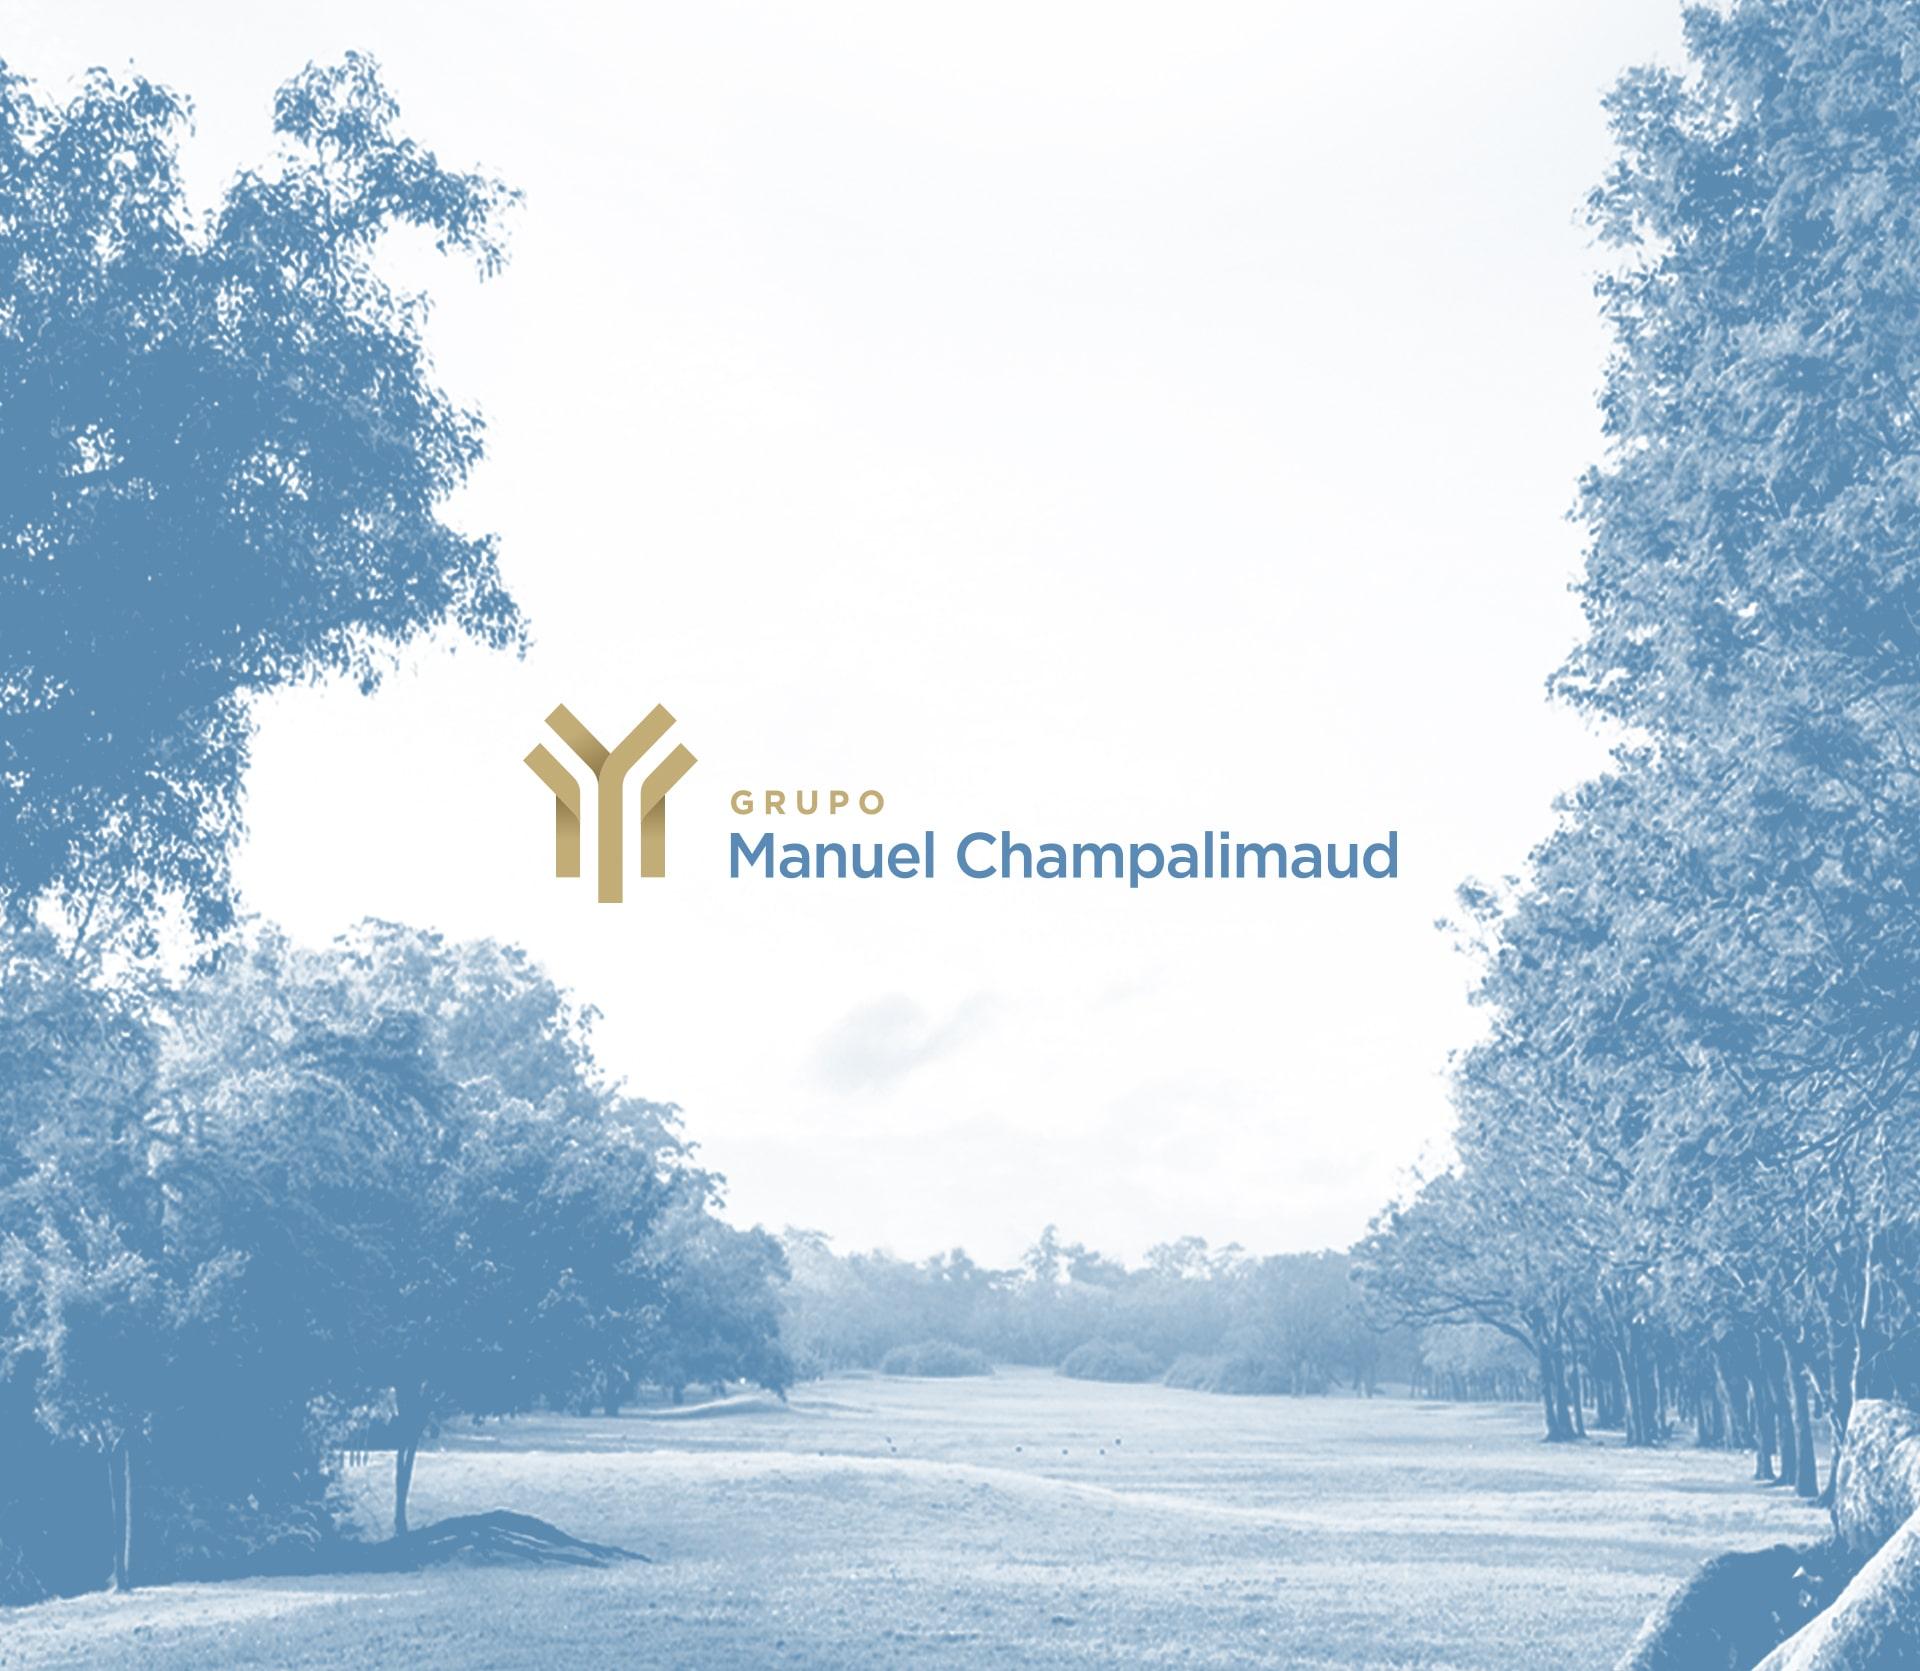 De Gestmin a Grupo Manuel Champalimaud – Rebranding by Younik